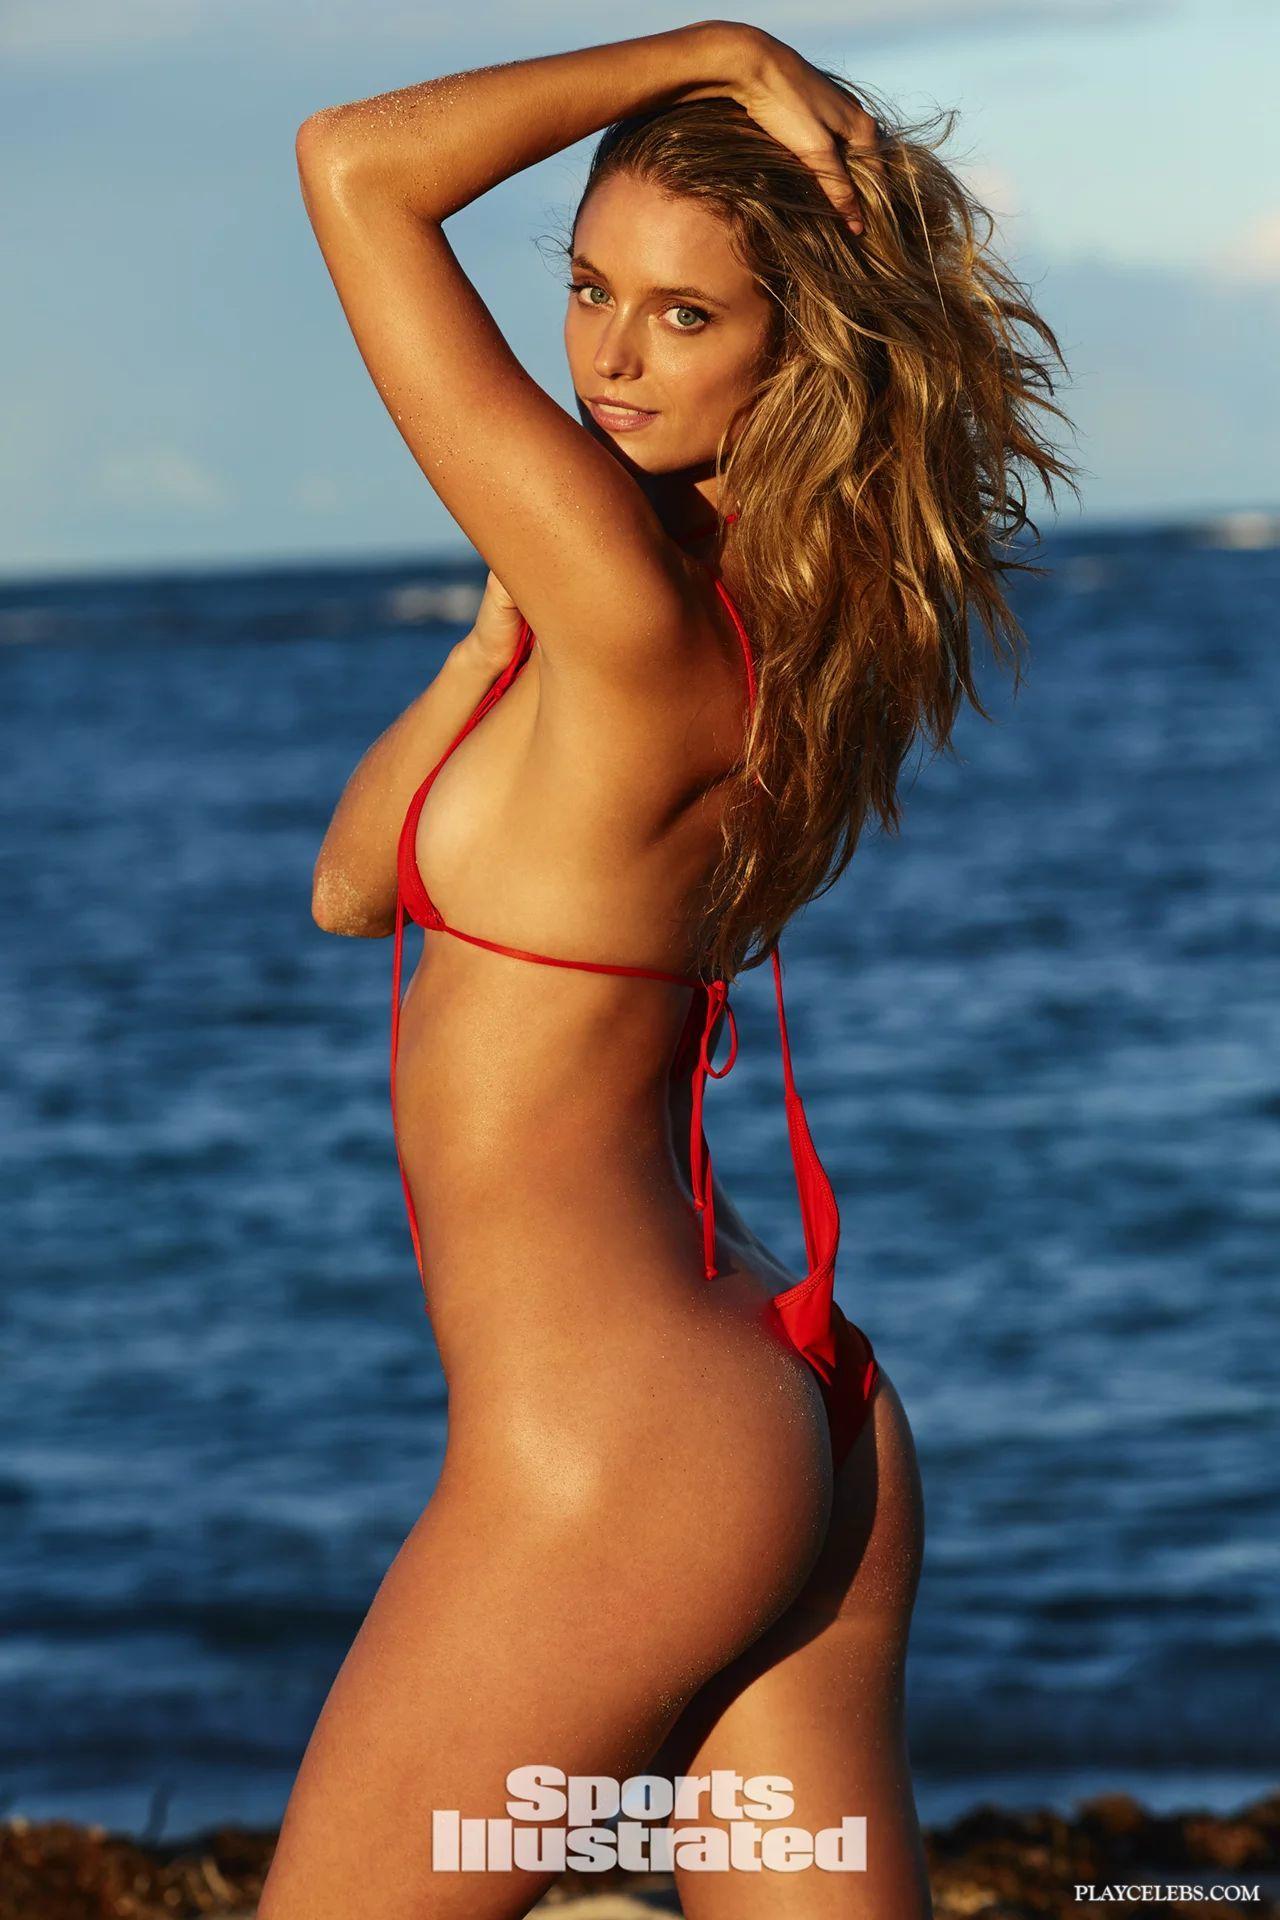 Model Kate Bock Cameltoe And Bikini On A Beach